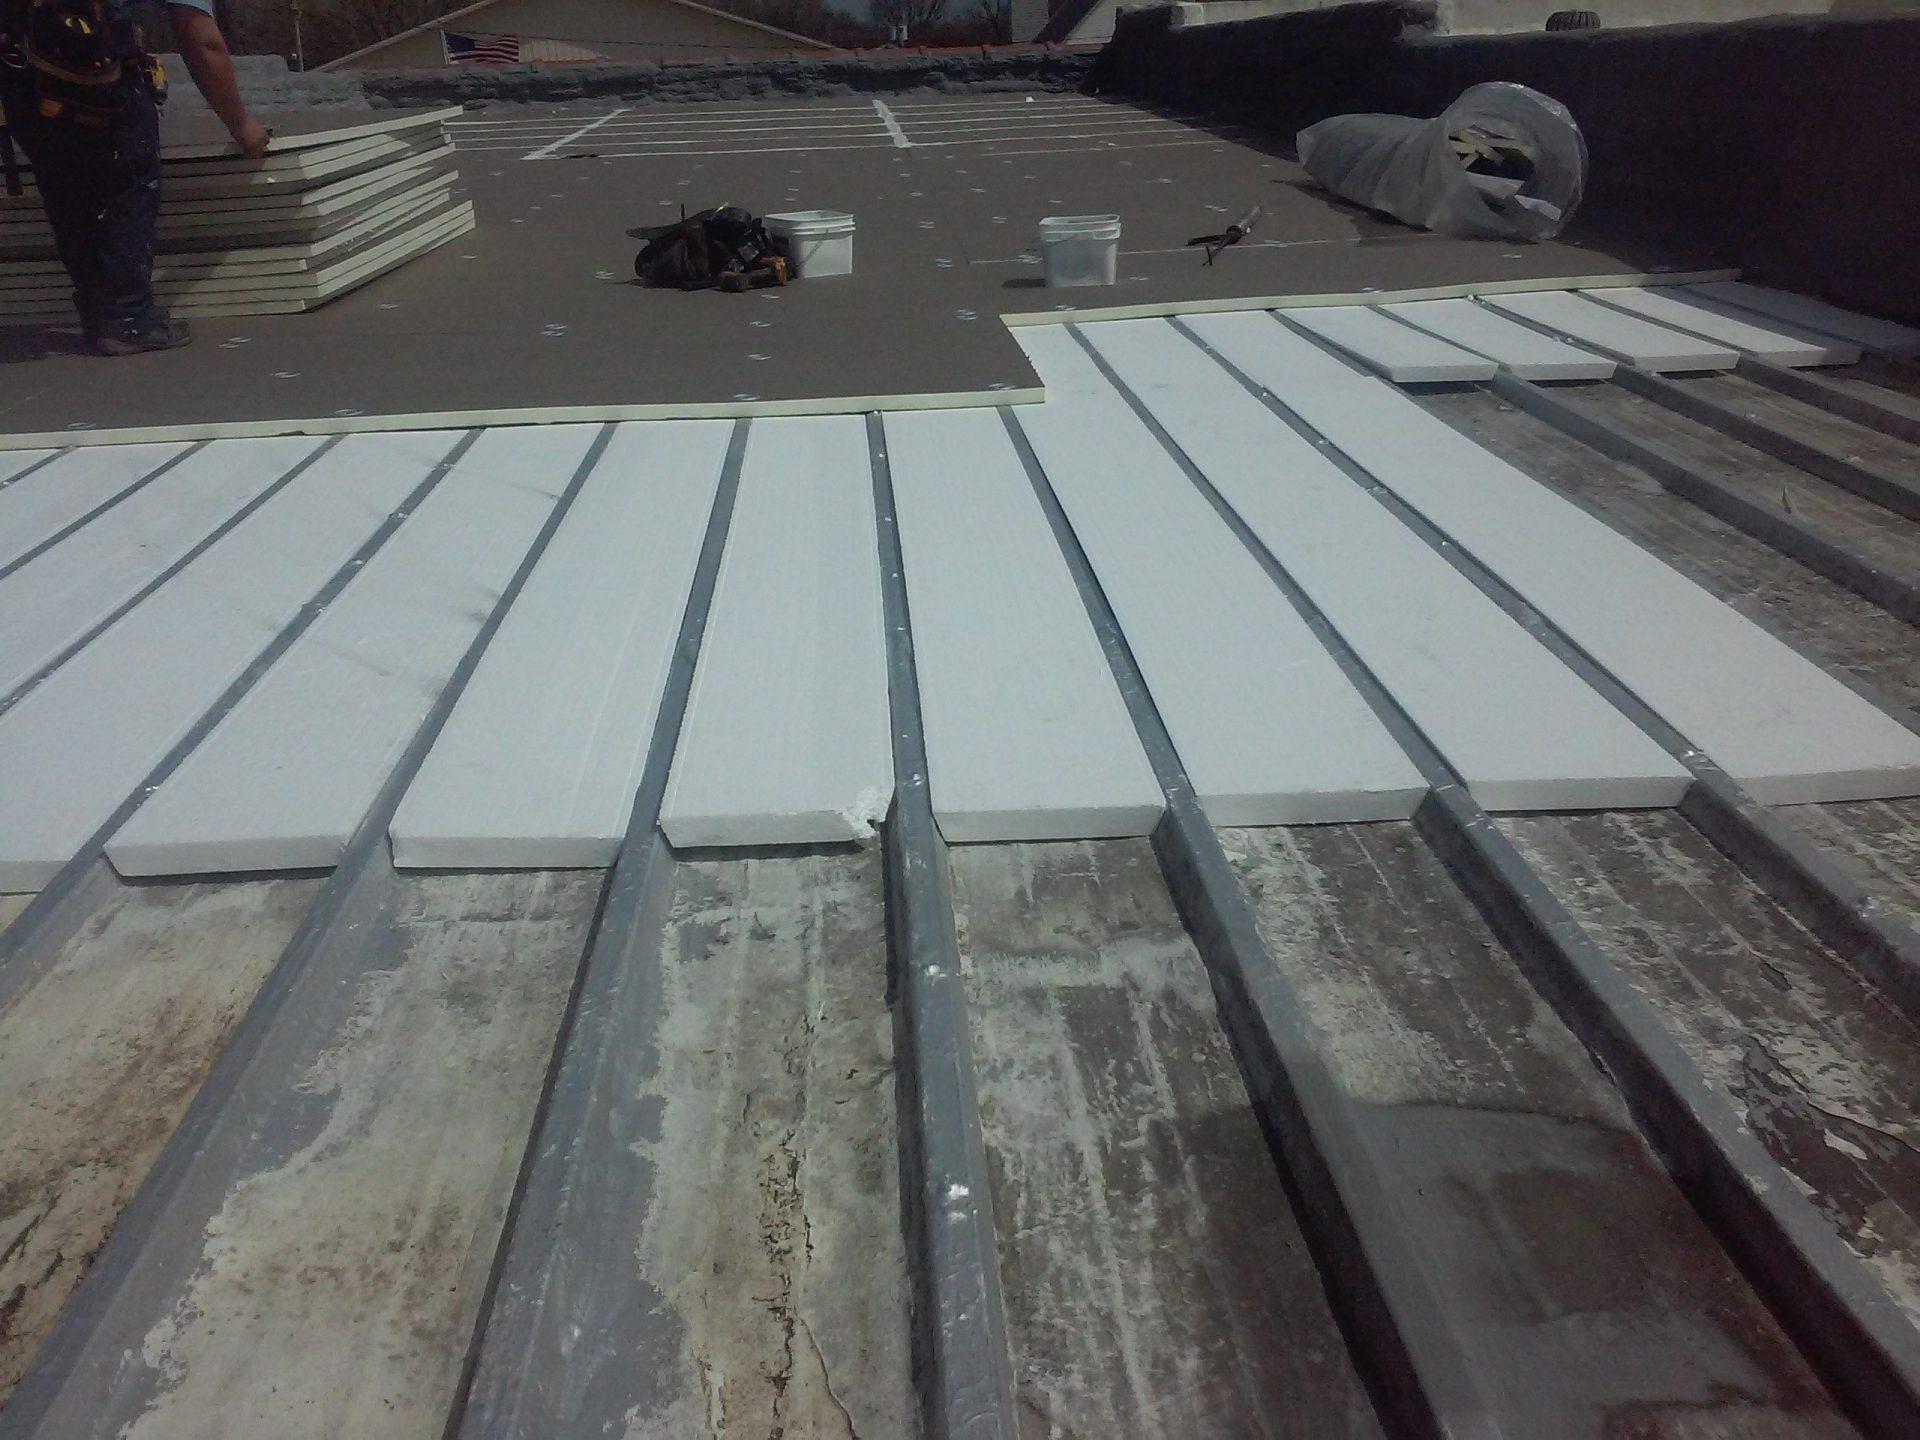 roof restoration in progress